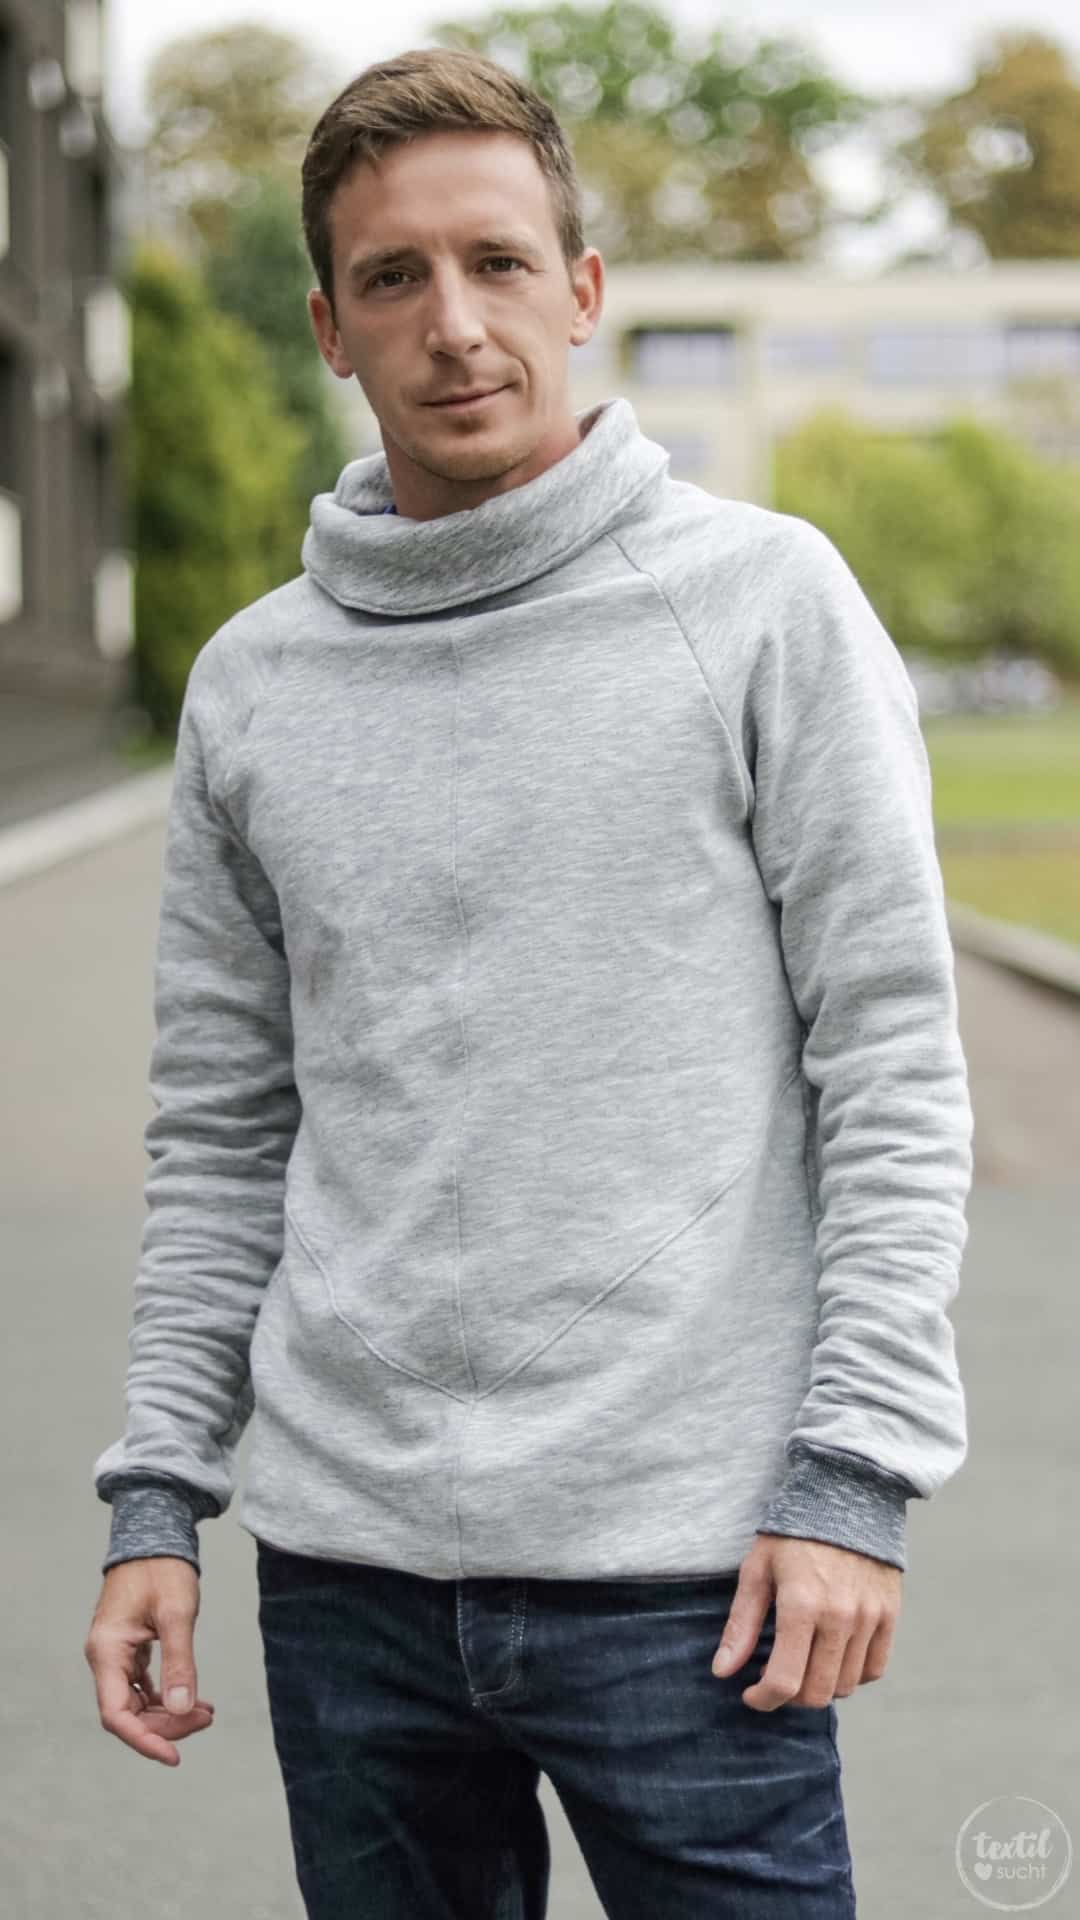 Schnittmuster Sweater Kuschelwarm